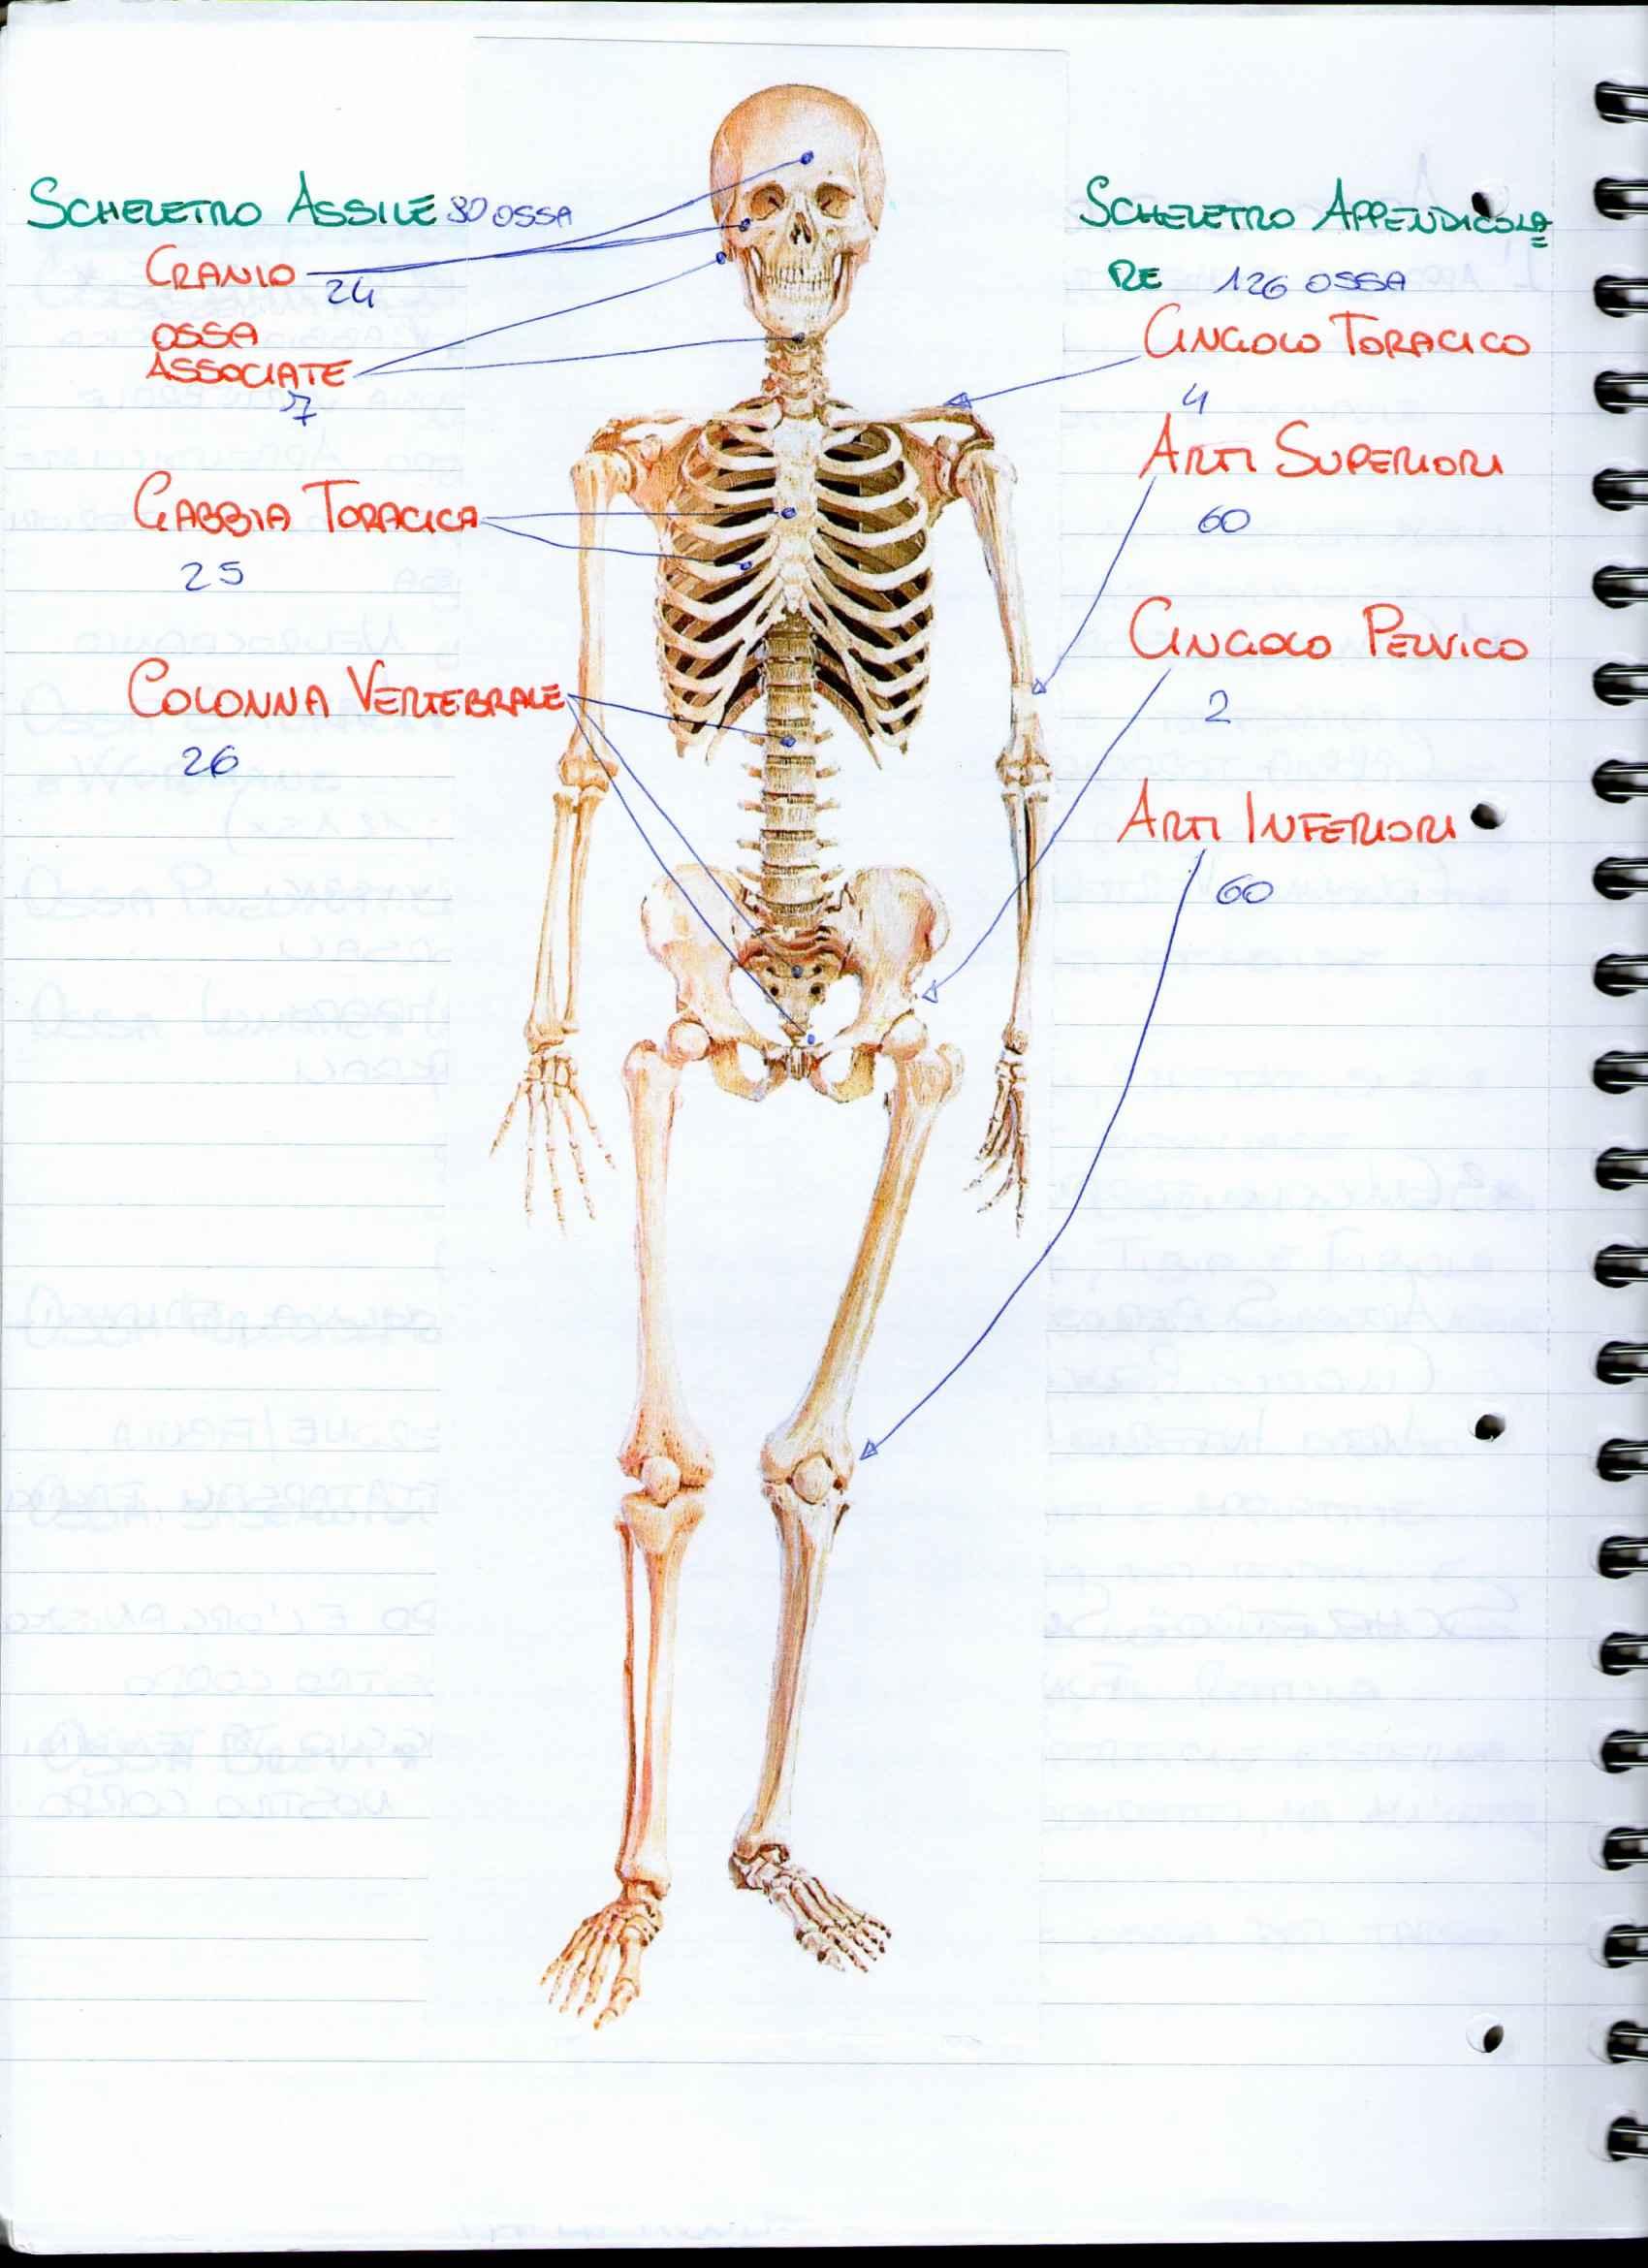 Riassunto esame Anatomia Umana, apparato scheletrico, prof. Ripani, libro consigliato Anatomia umana di Martini, Timmons e Tallitsch Pag. 2